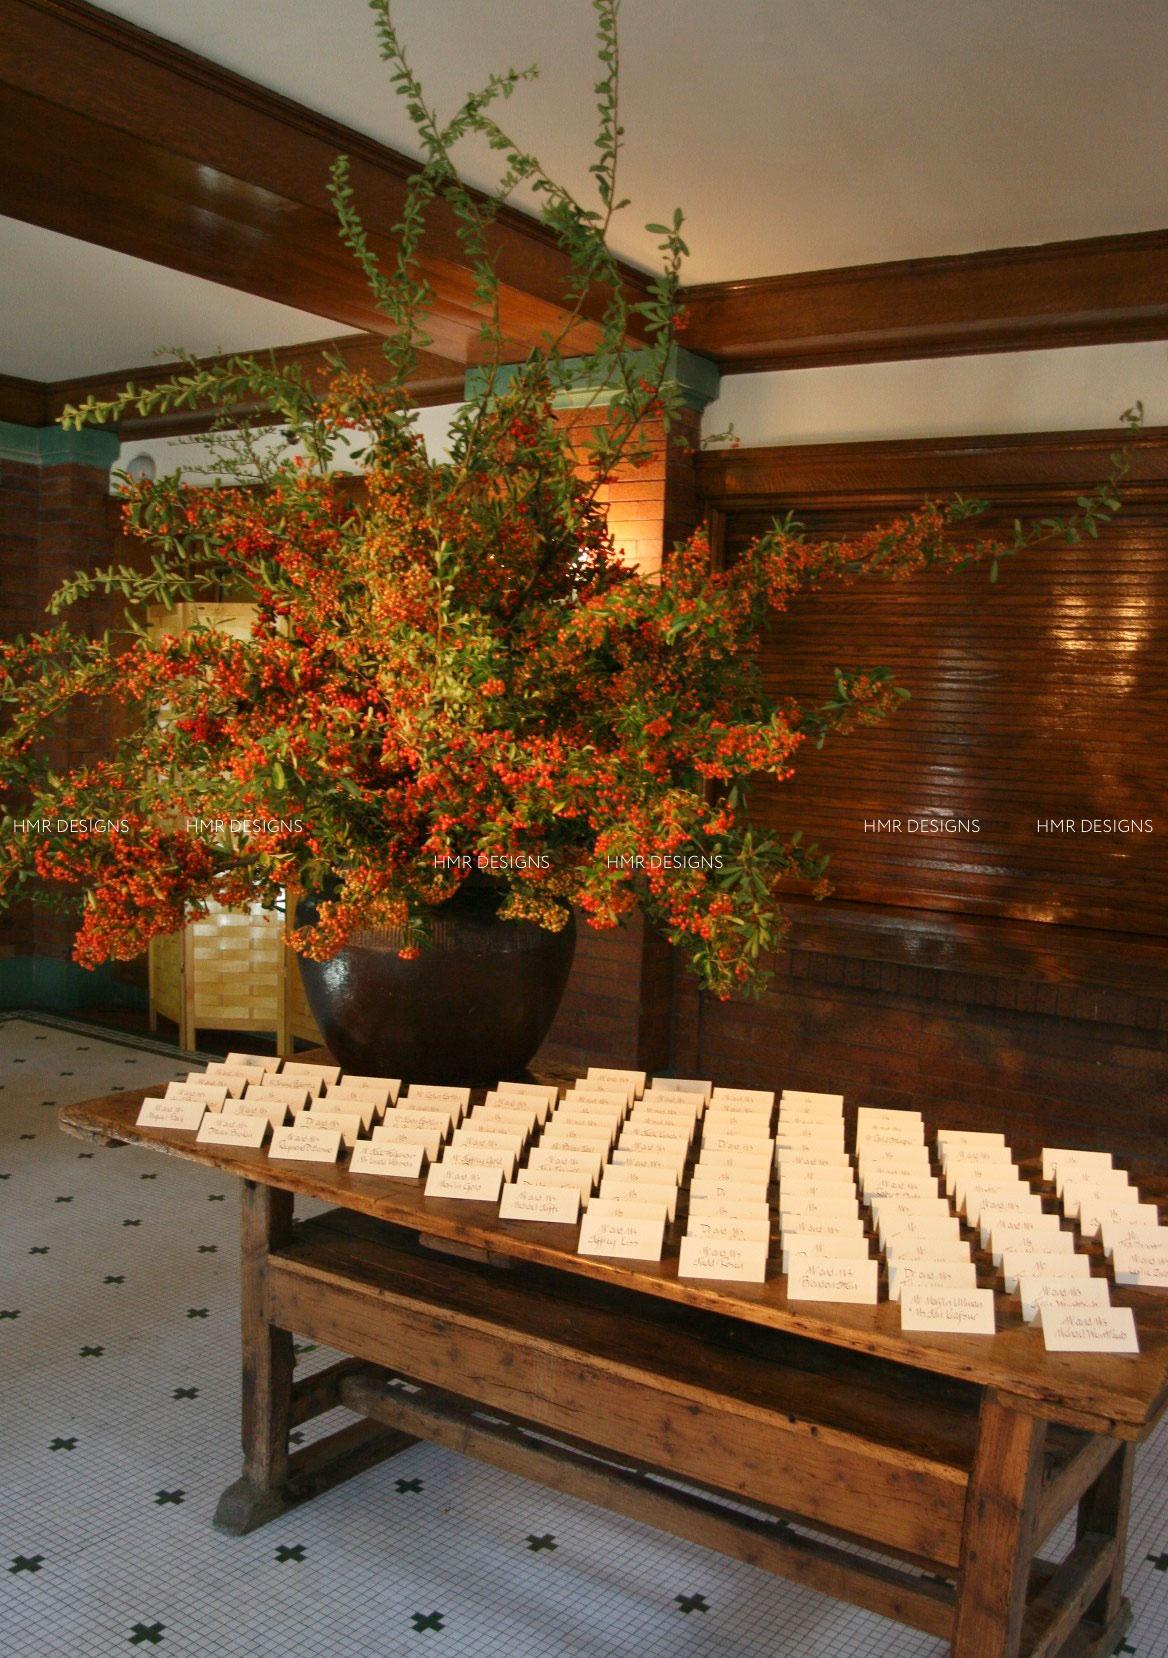 Ilex berries and place cards. HMR Designs